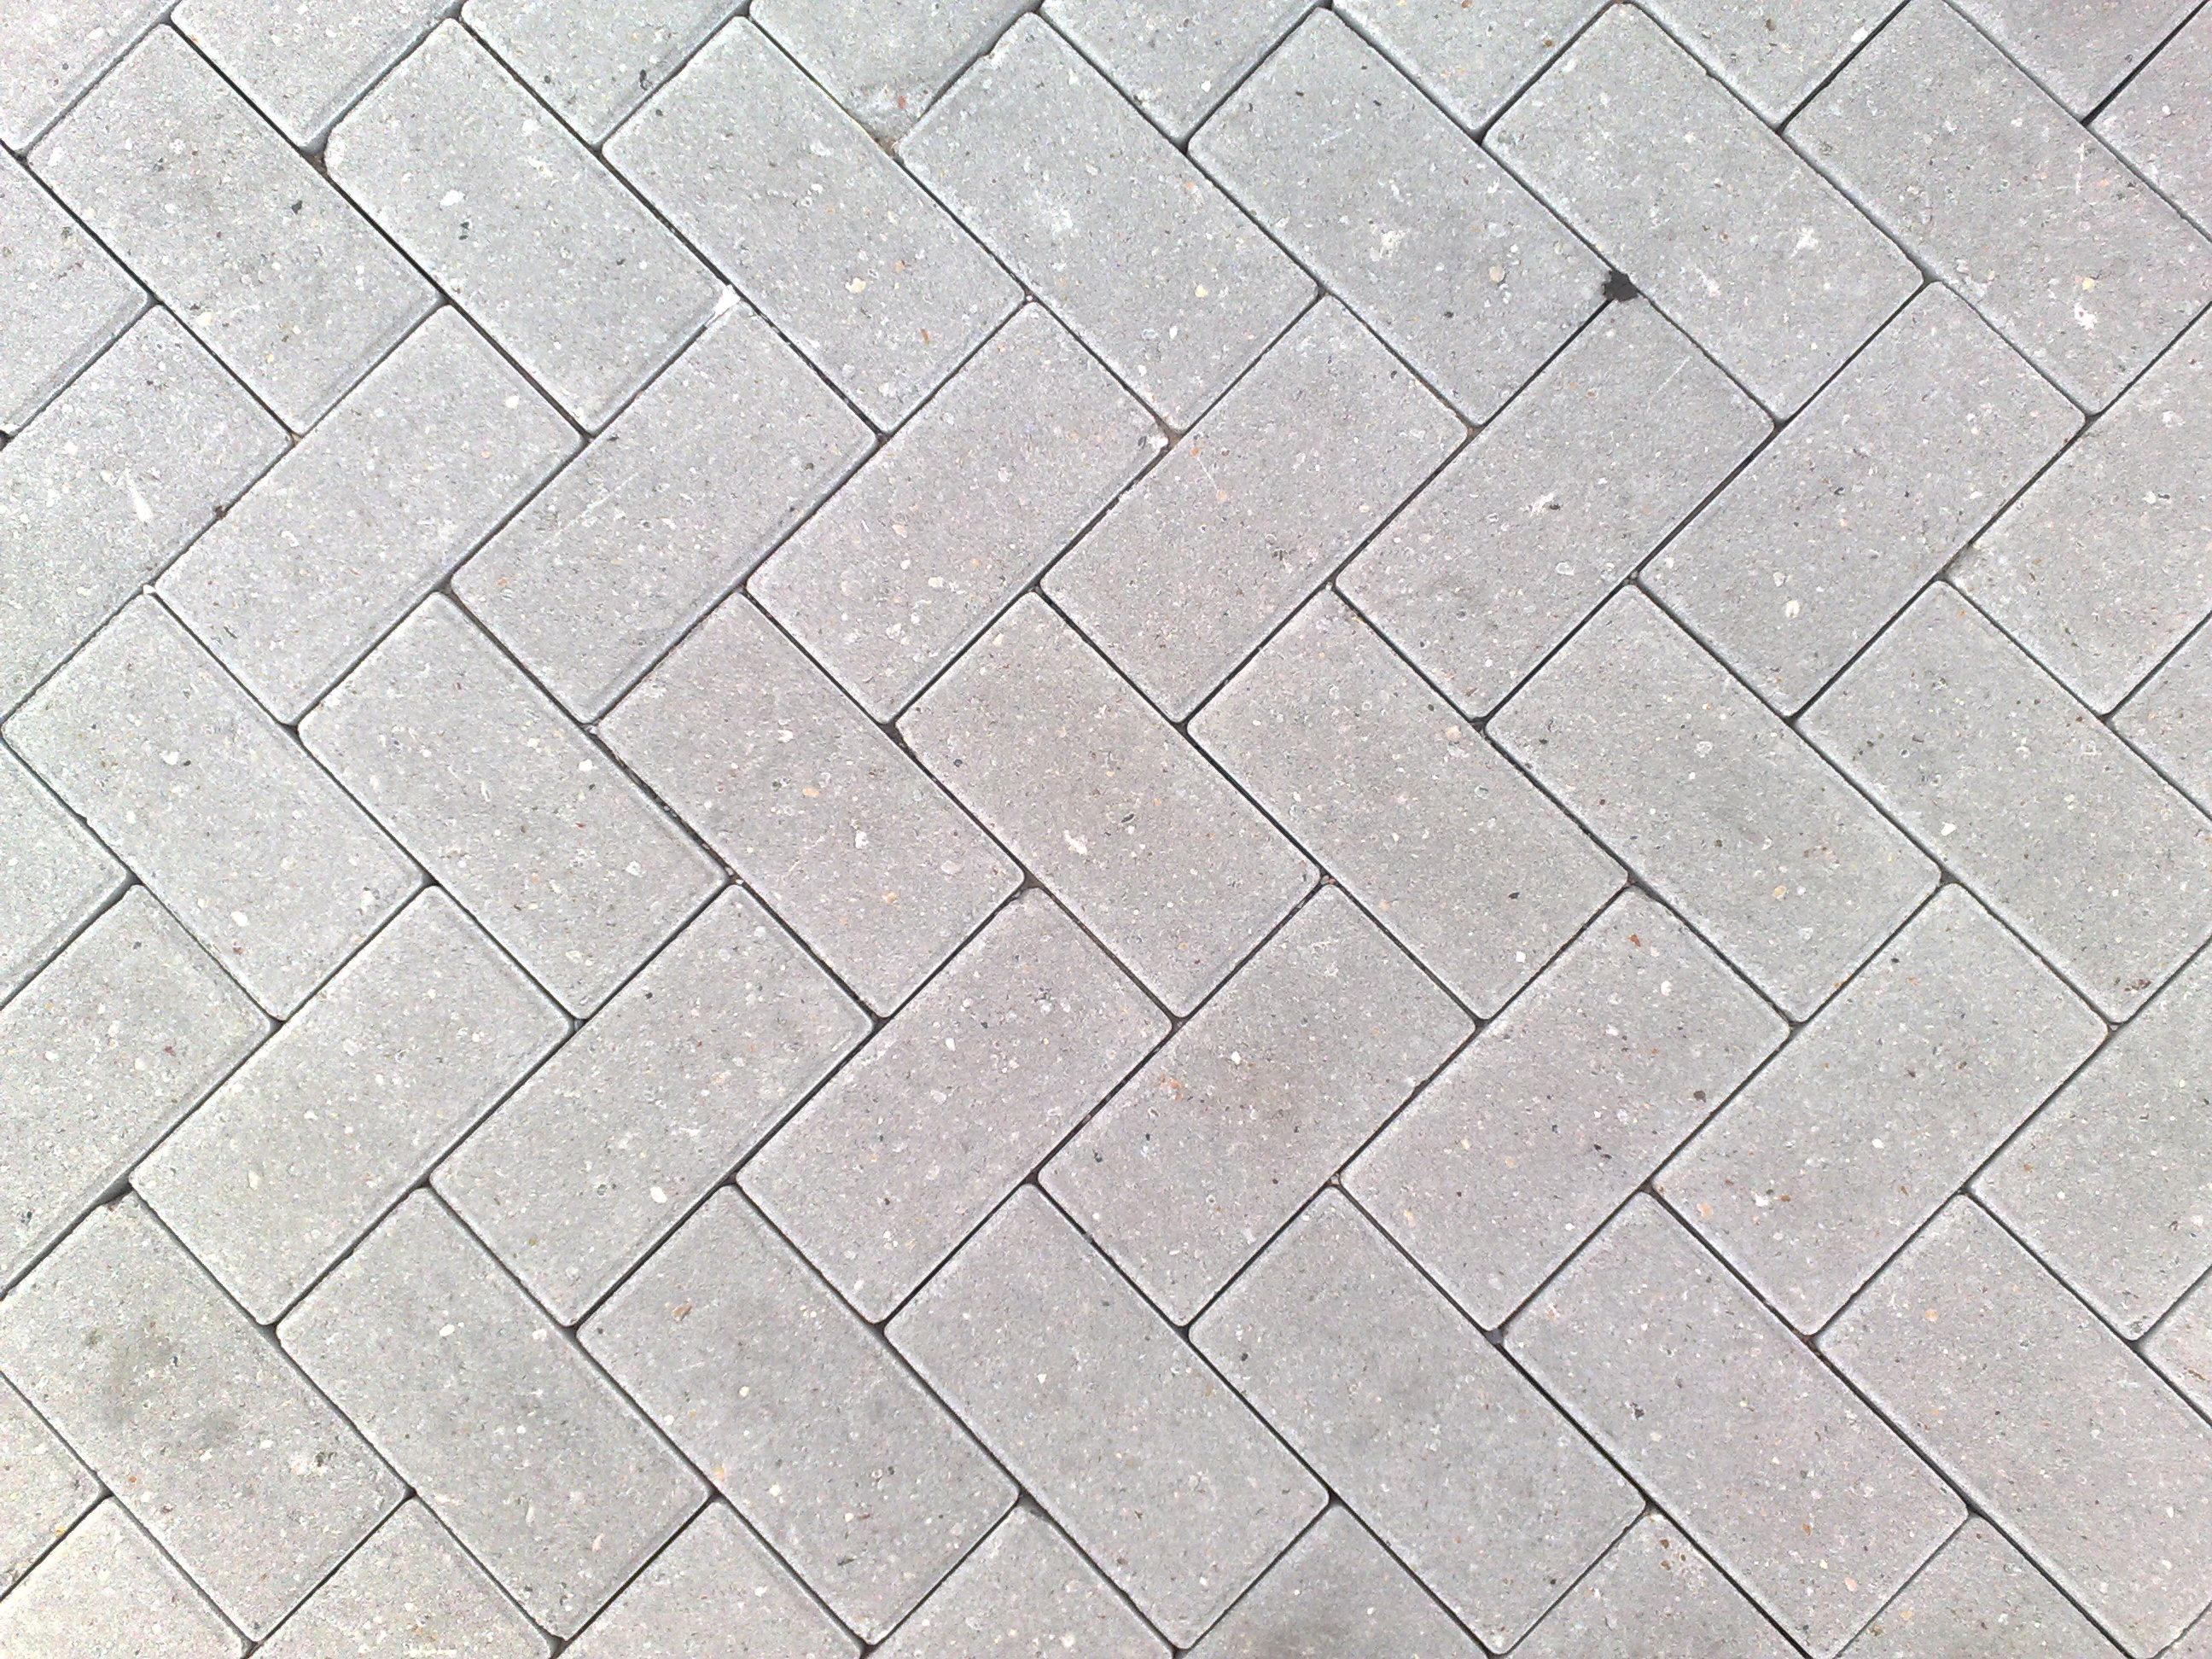 Brick Road 1 Texture by Jay-B-Rich